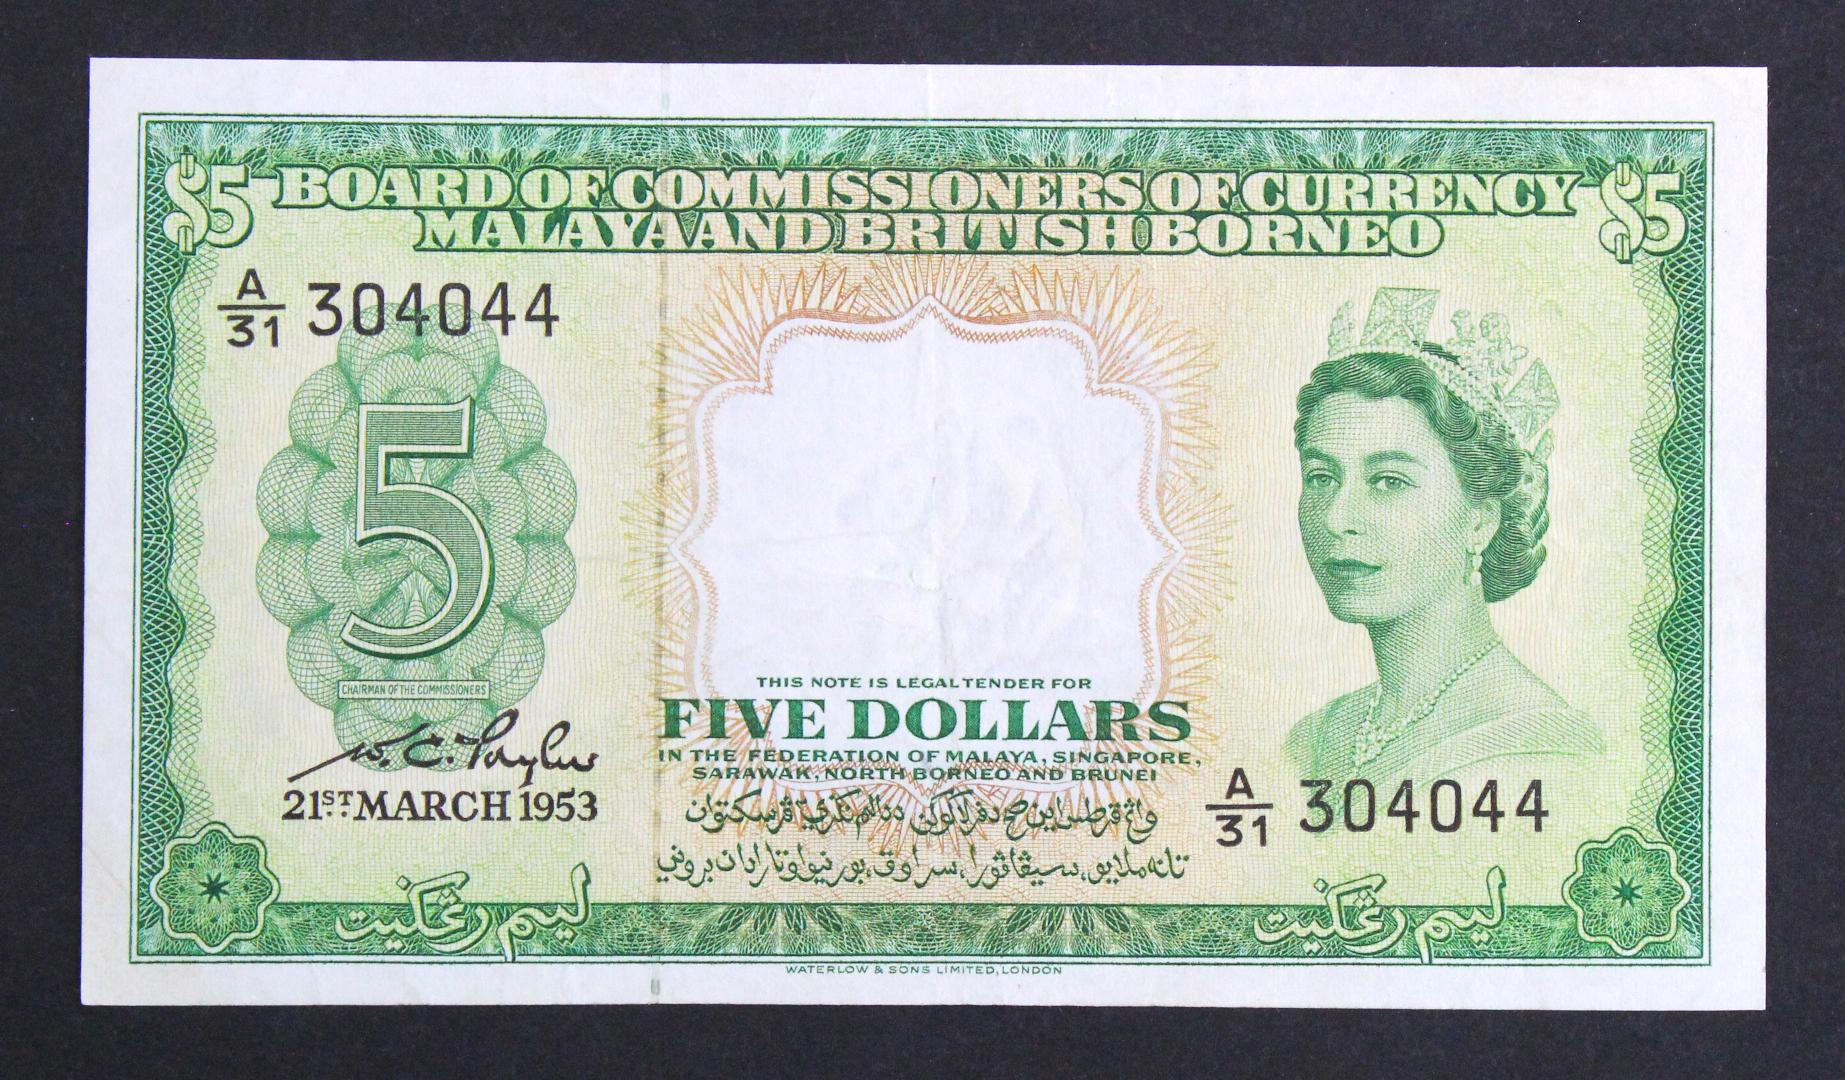 Malaya & British Borneo 5 Dollars dated 21st March 1953, serial A/31 304044 (TBB B102a, Pick2a)